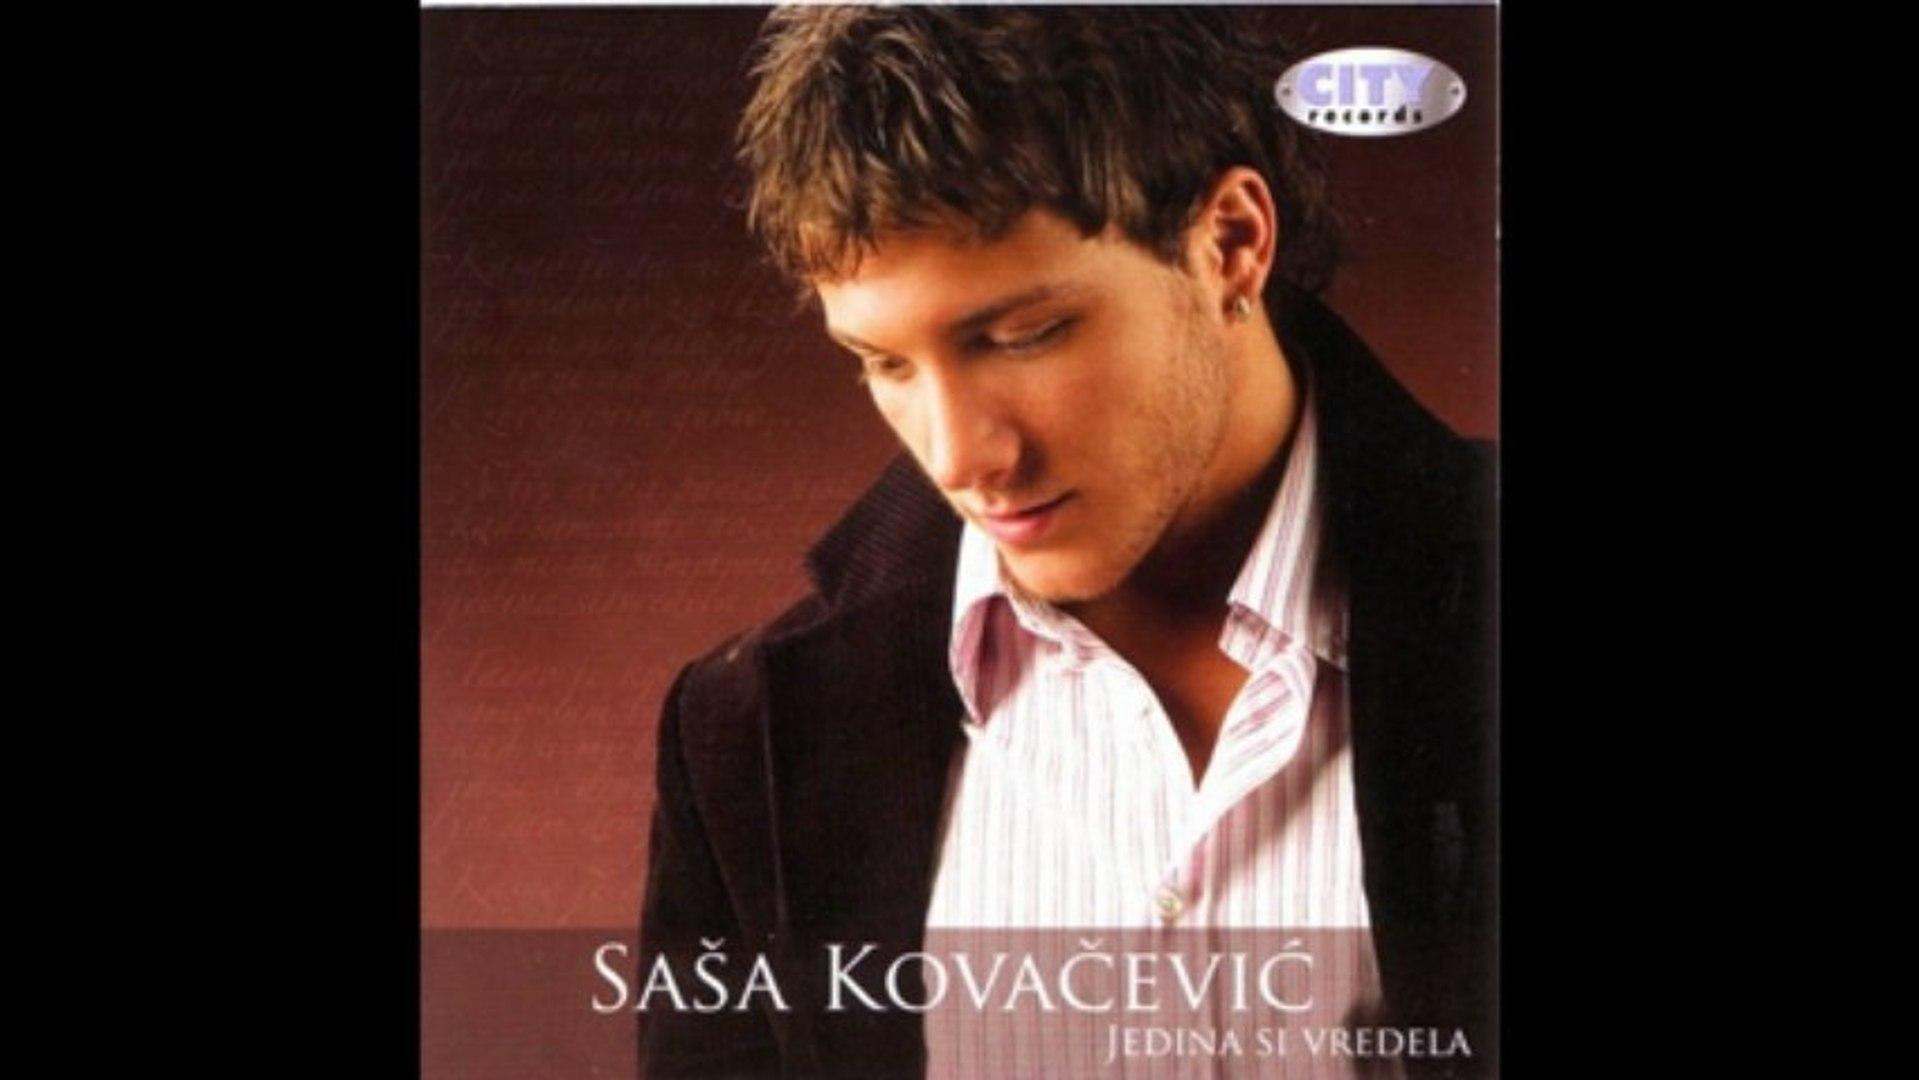 Sasa Kovacevic - Jasno ko dan - (Audio 2006) HD